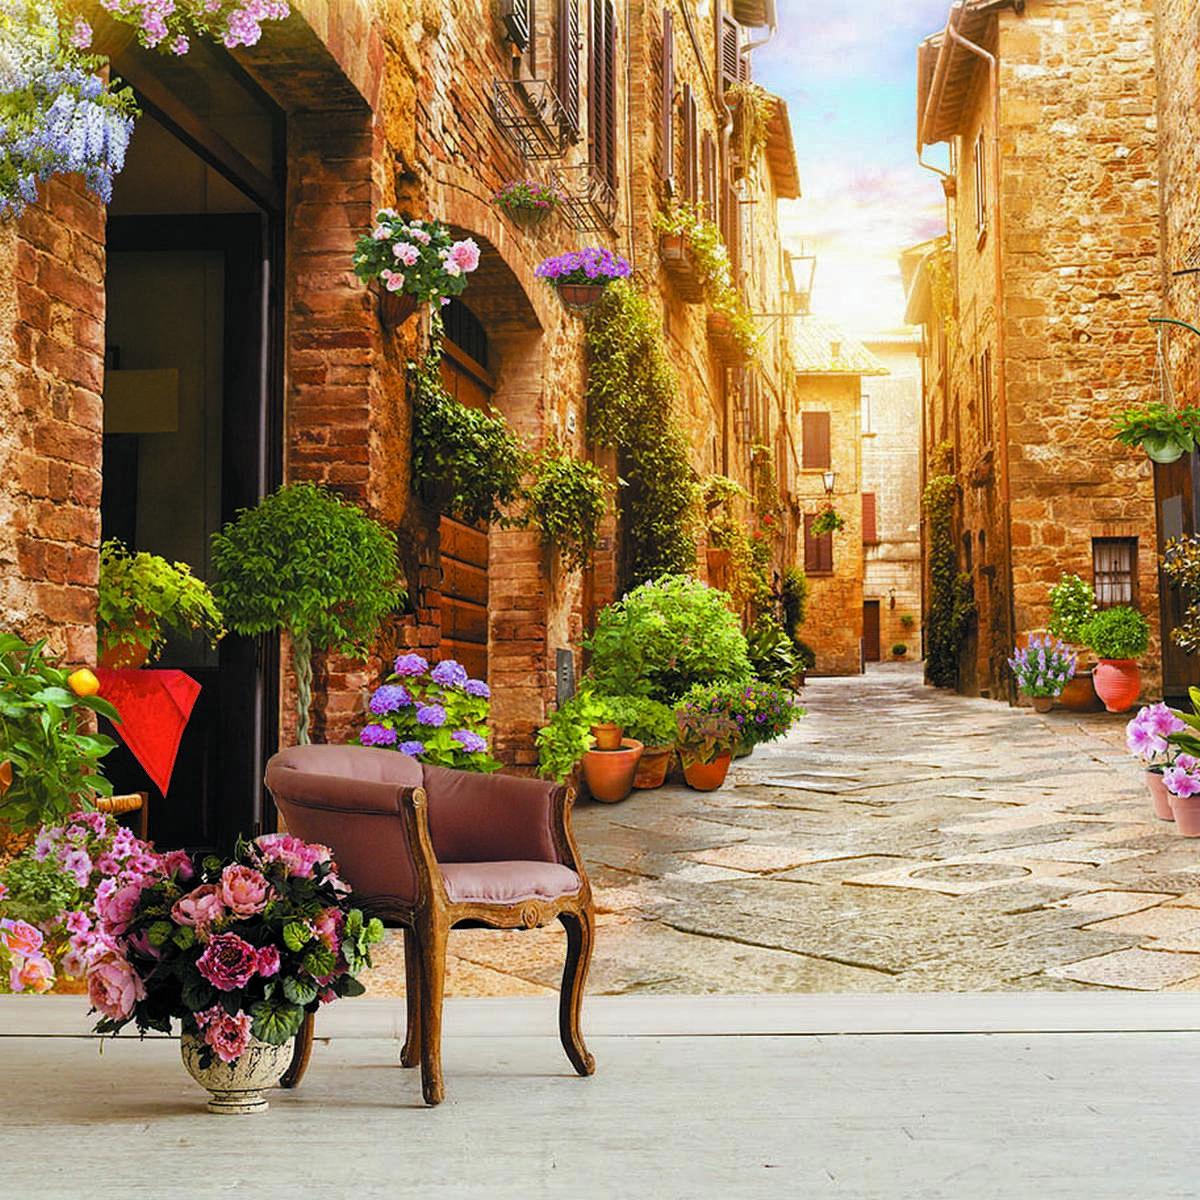 Картинки улочки и дворики